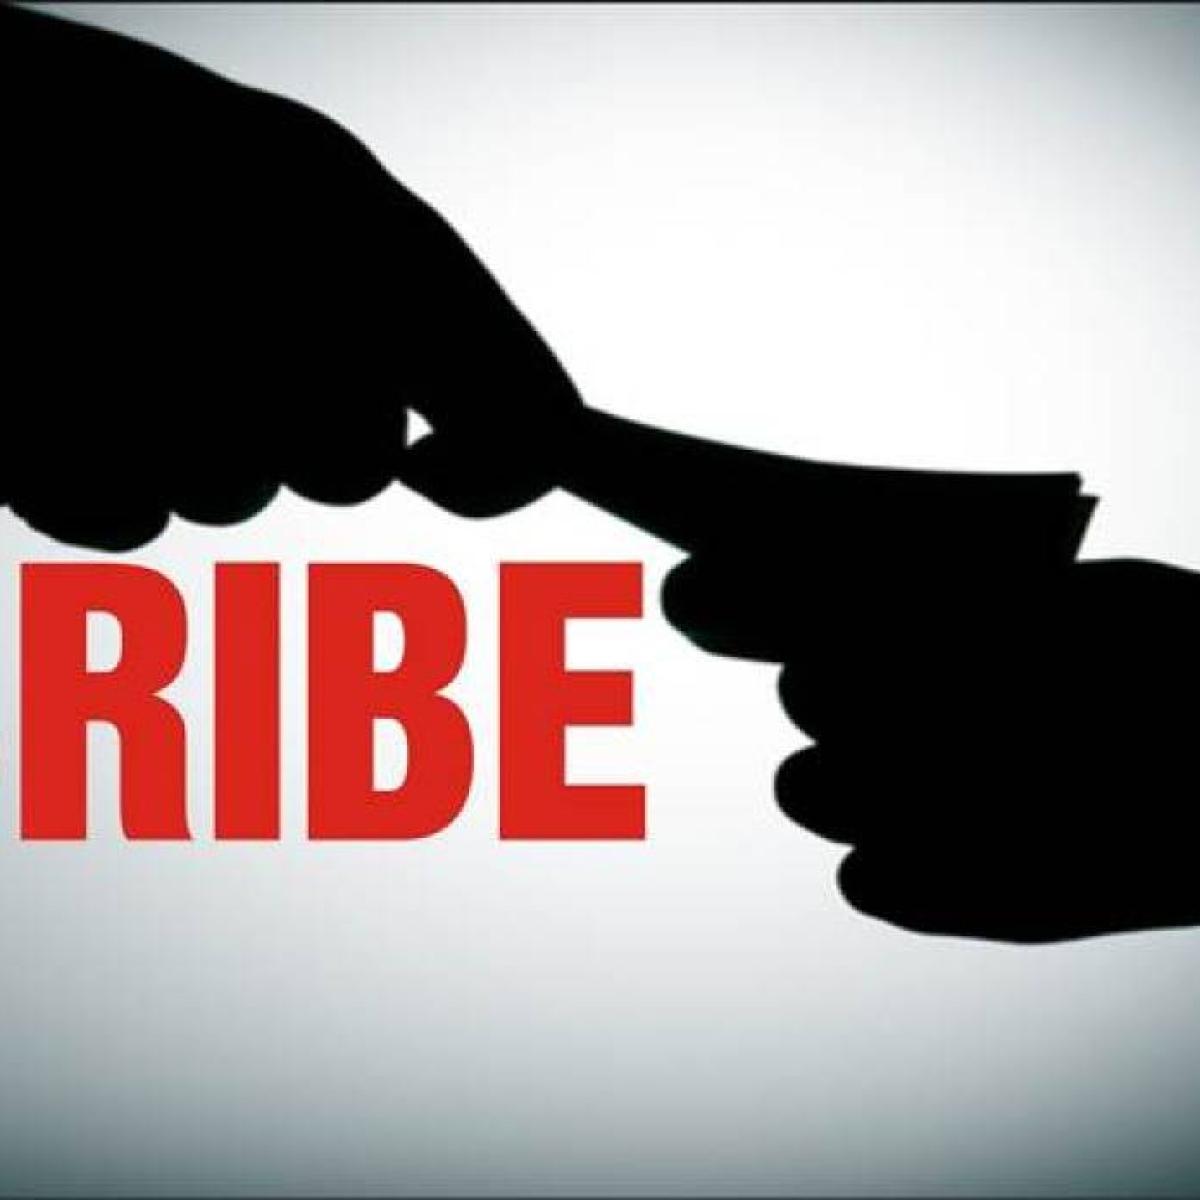 Mumbai: ACB books Class 1 officer, junior in Rs 1 lakh bribery case